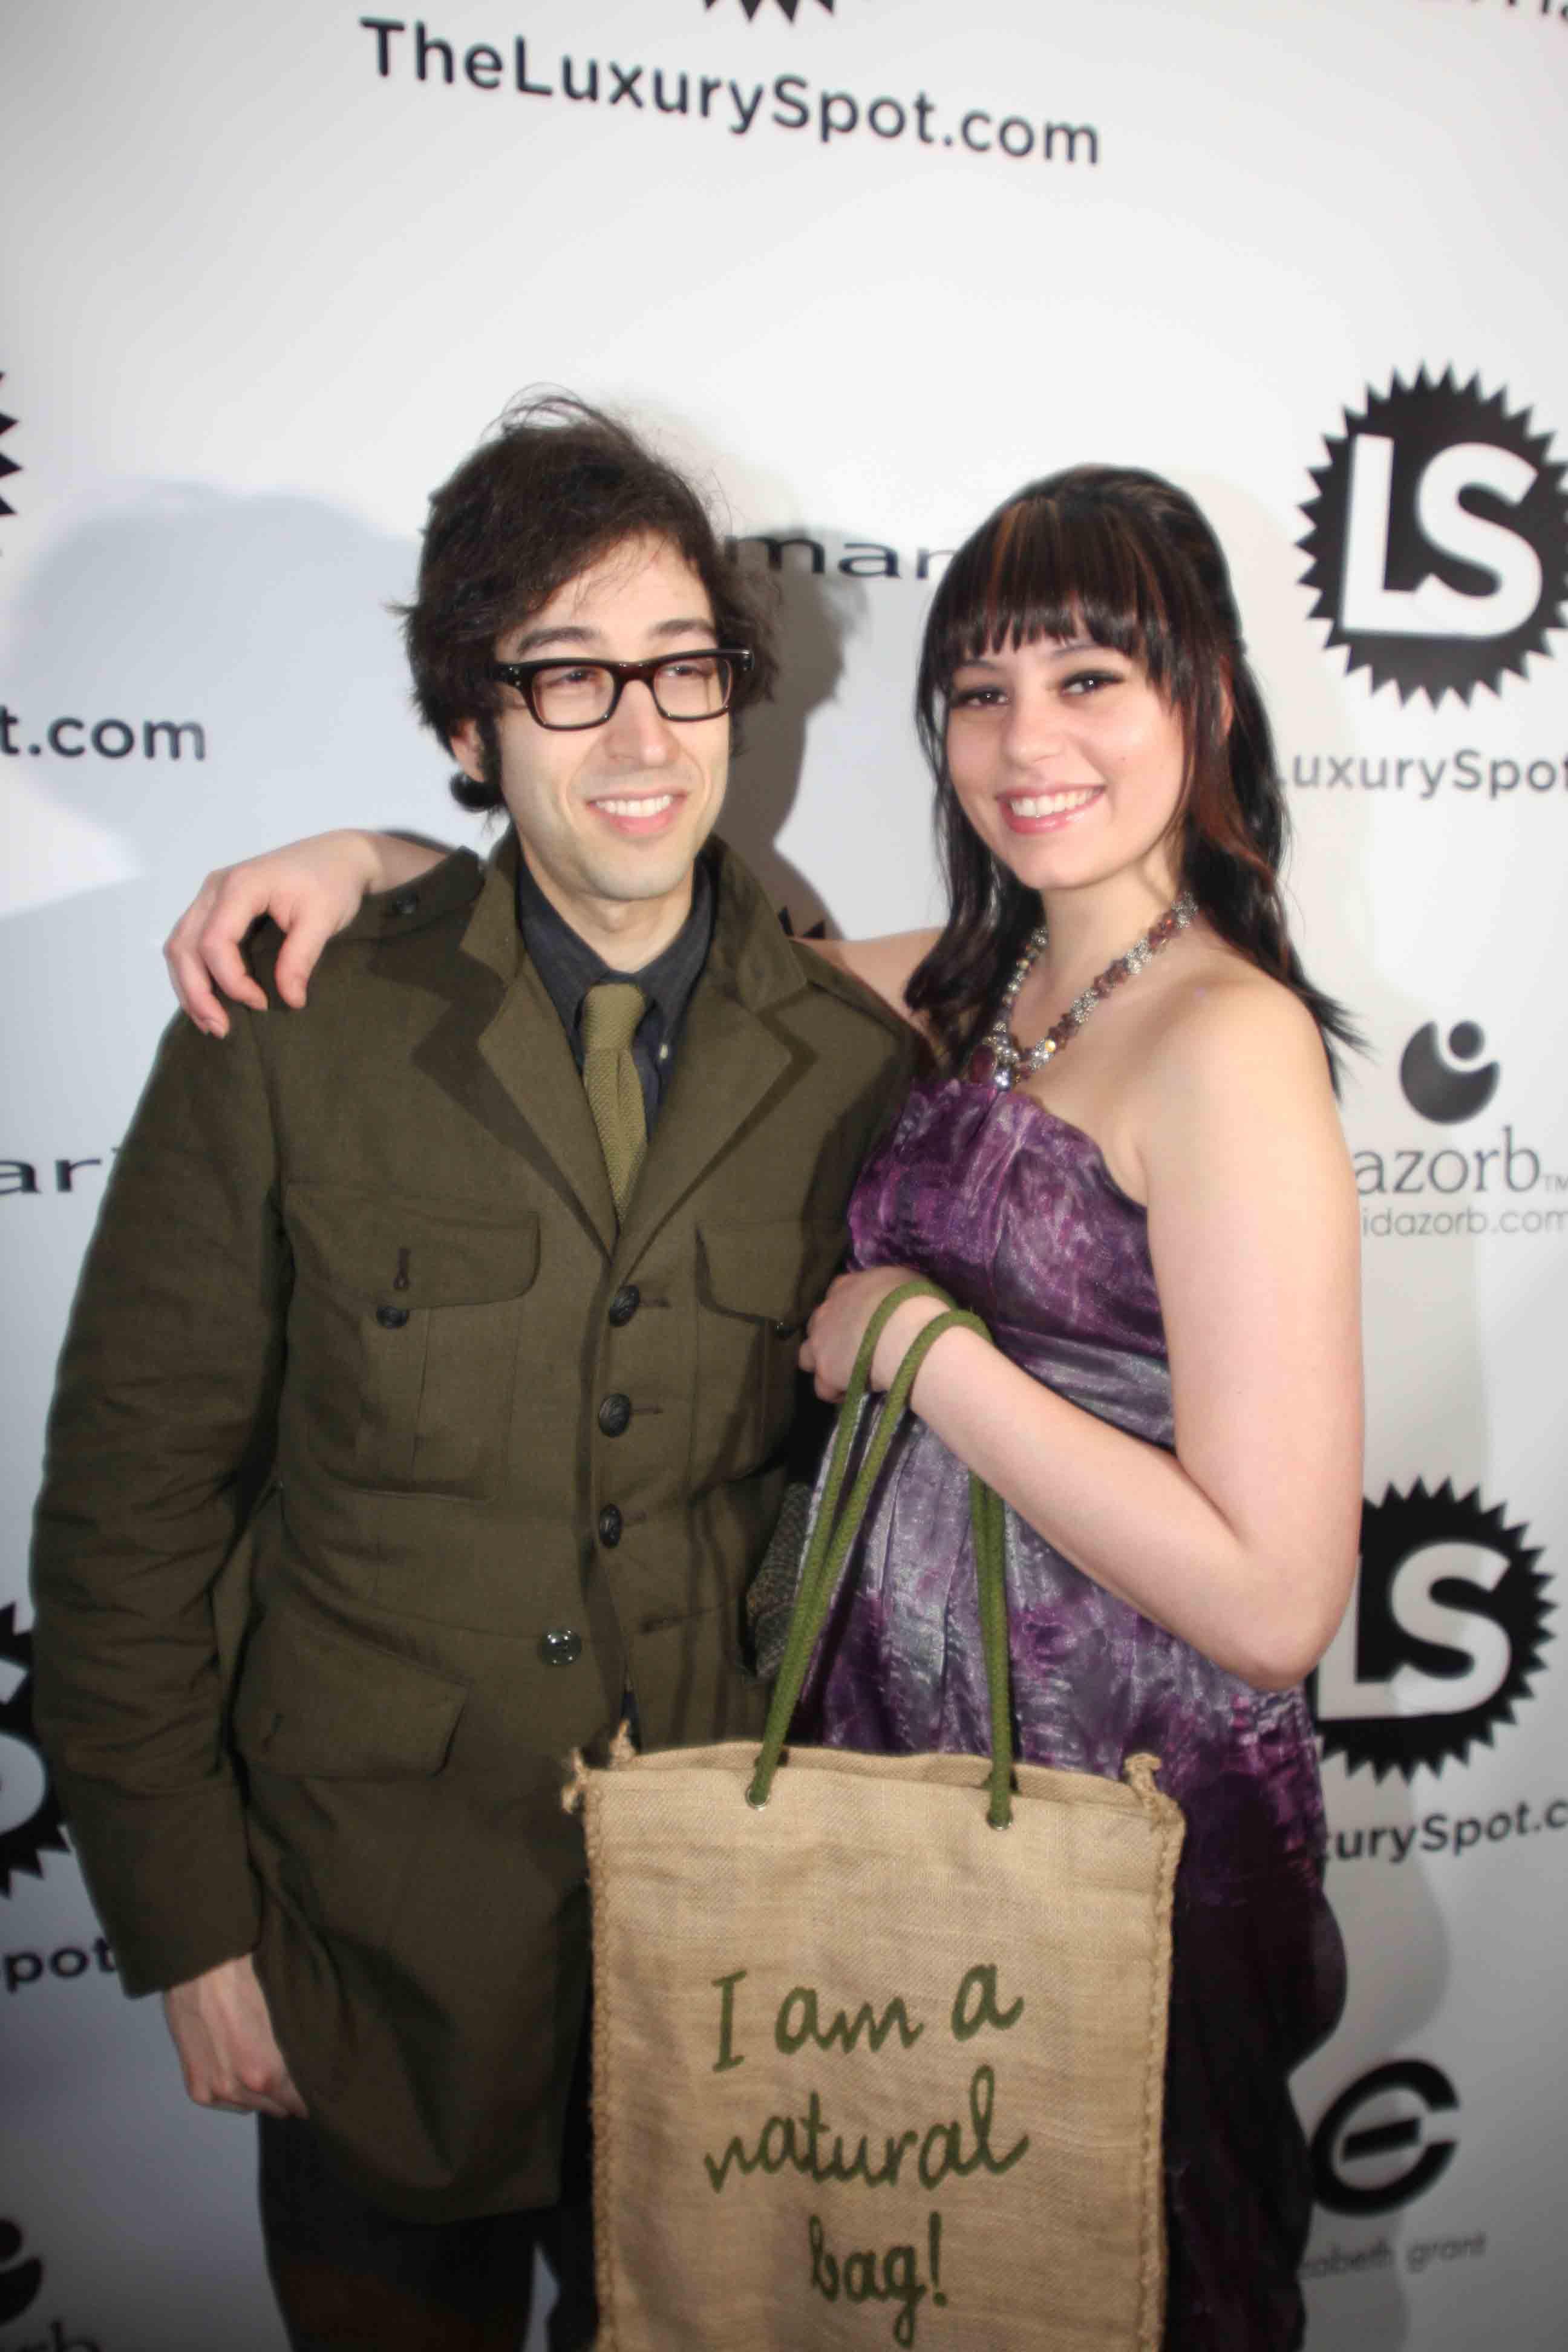 Aaron Short & Steph carrying our Beautorium.com Swag Bag